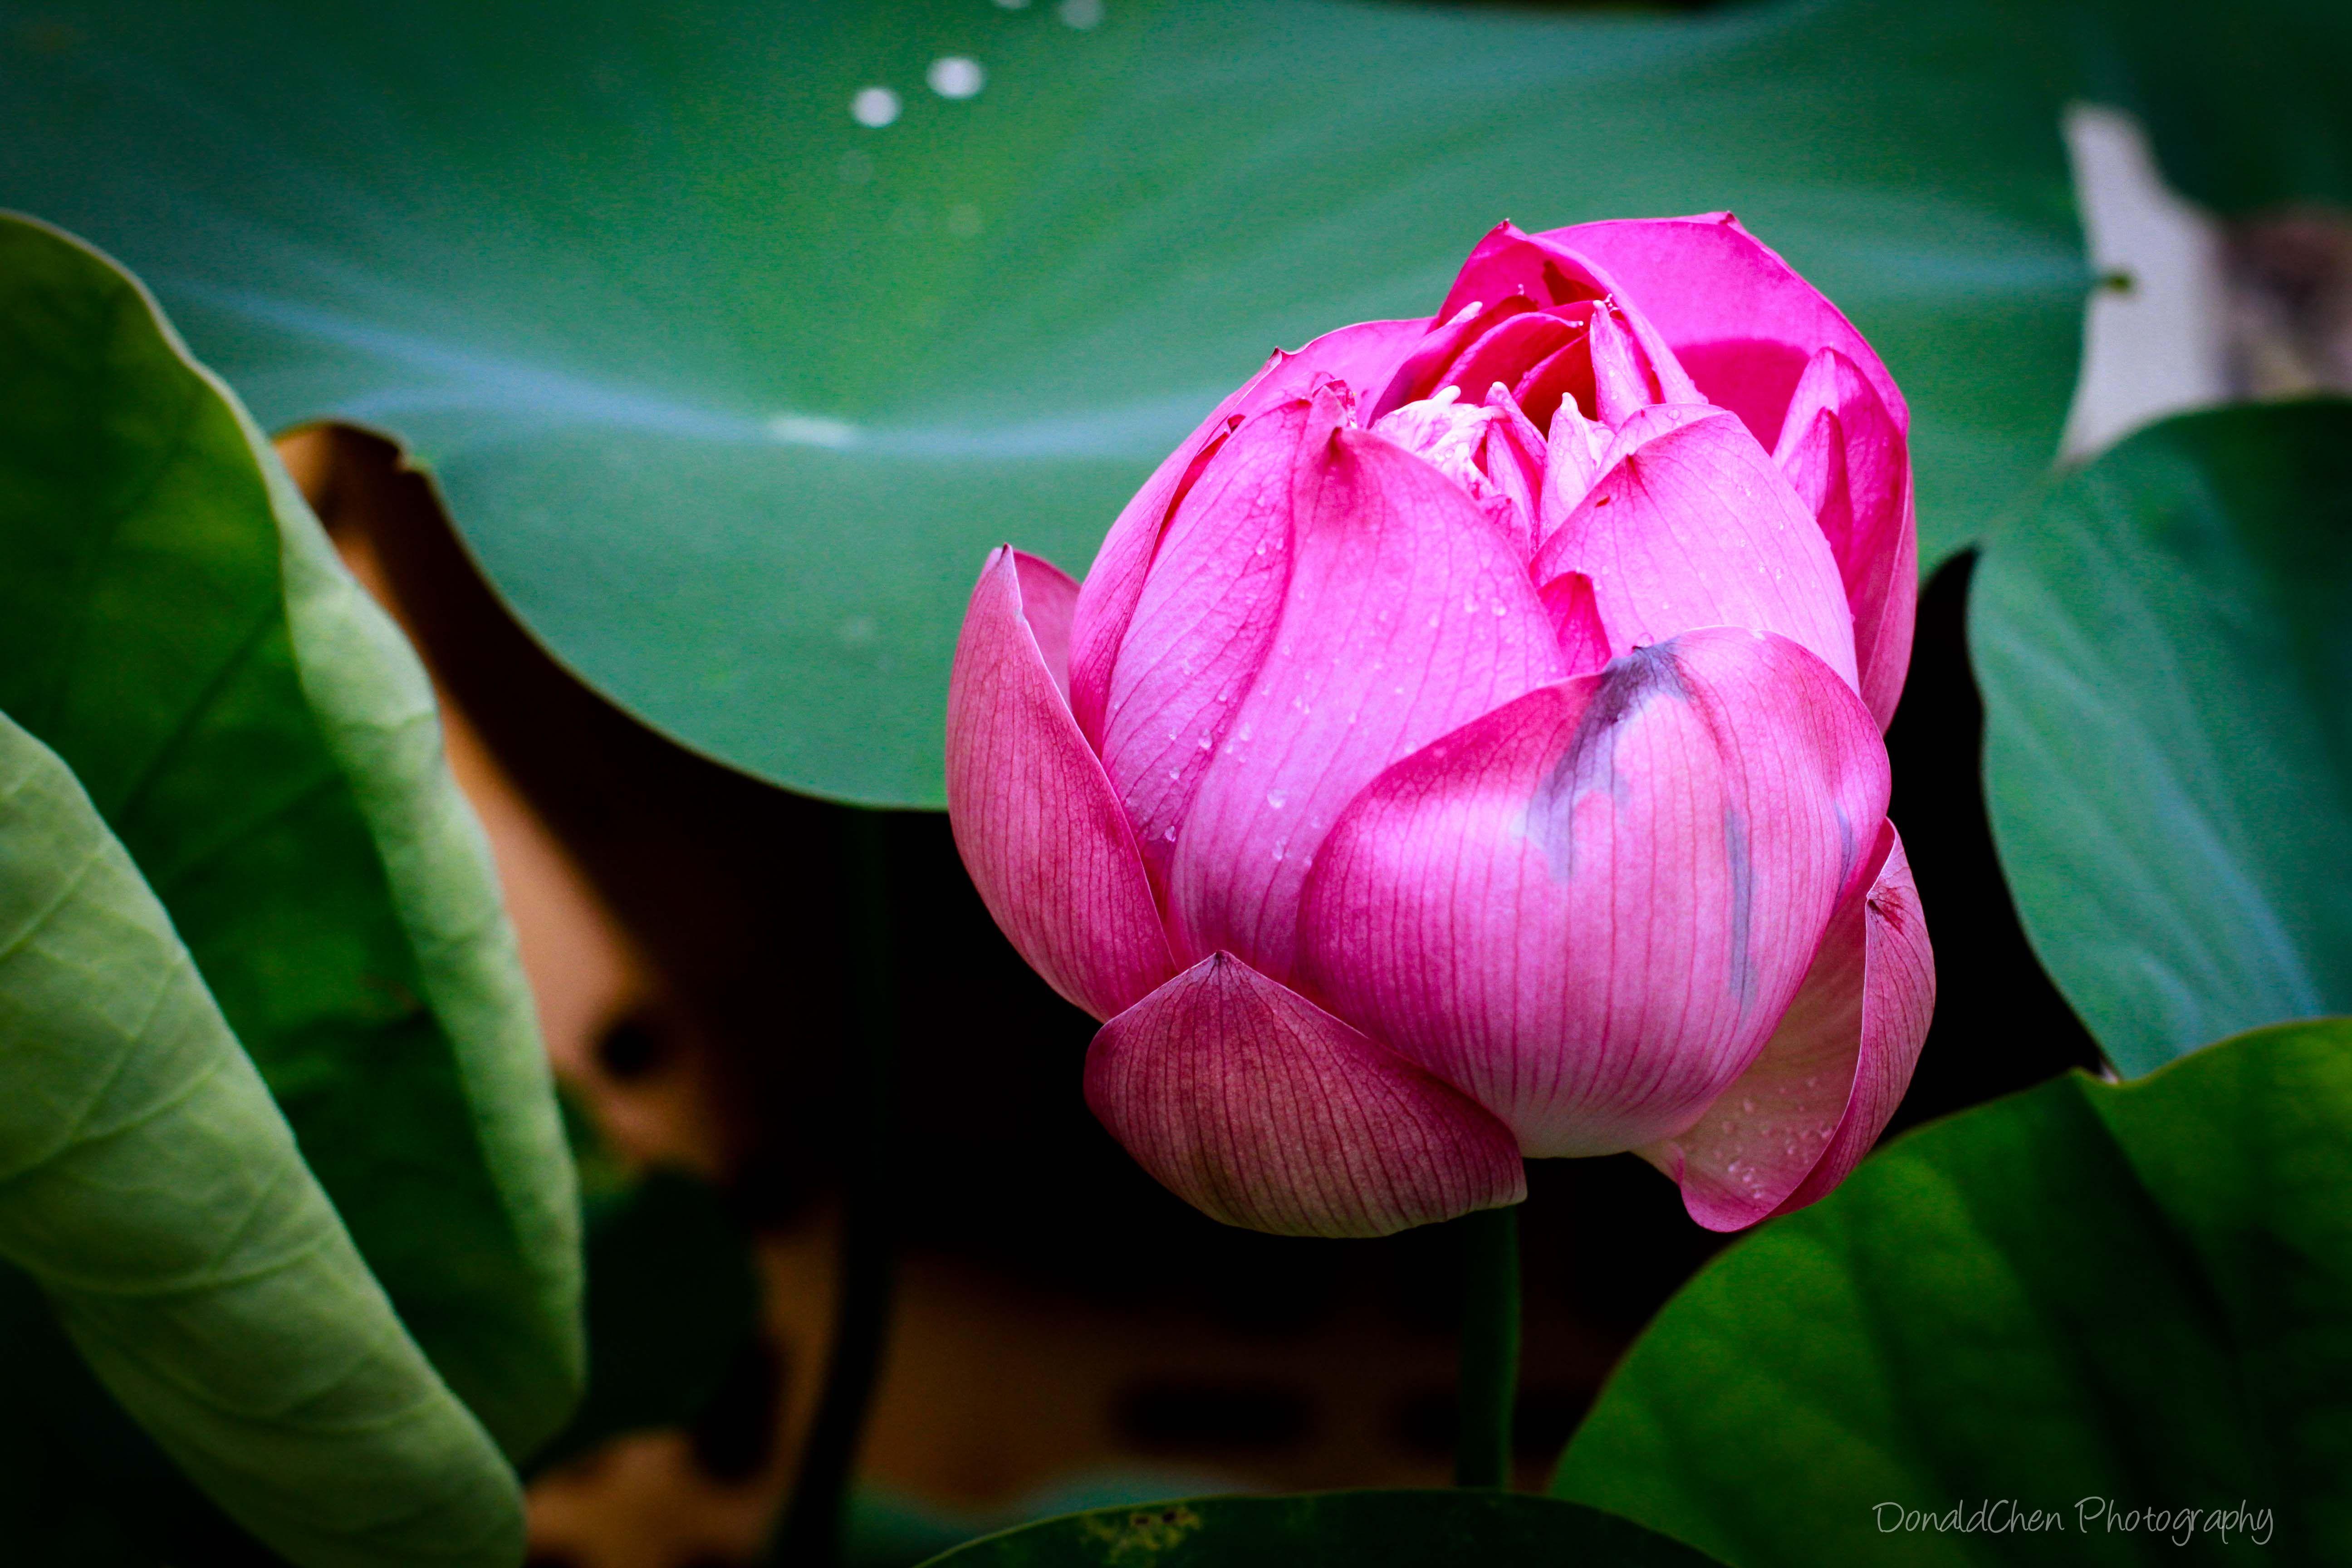 Lotus singapore flower its botanical name is nelumbo nucifera flower lotus singapore flower its botanical name izmirmasajfo Choice Image